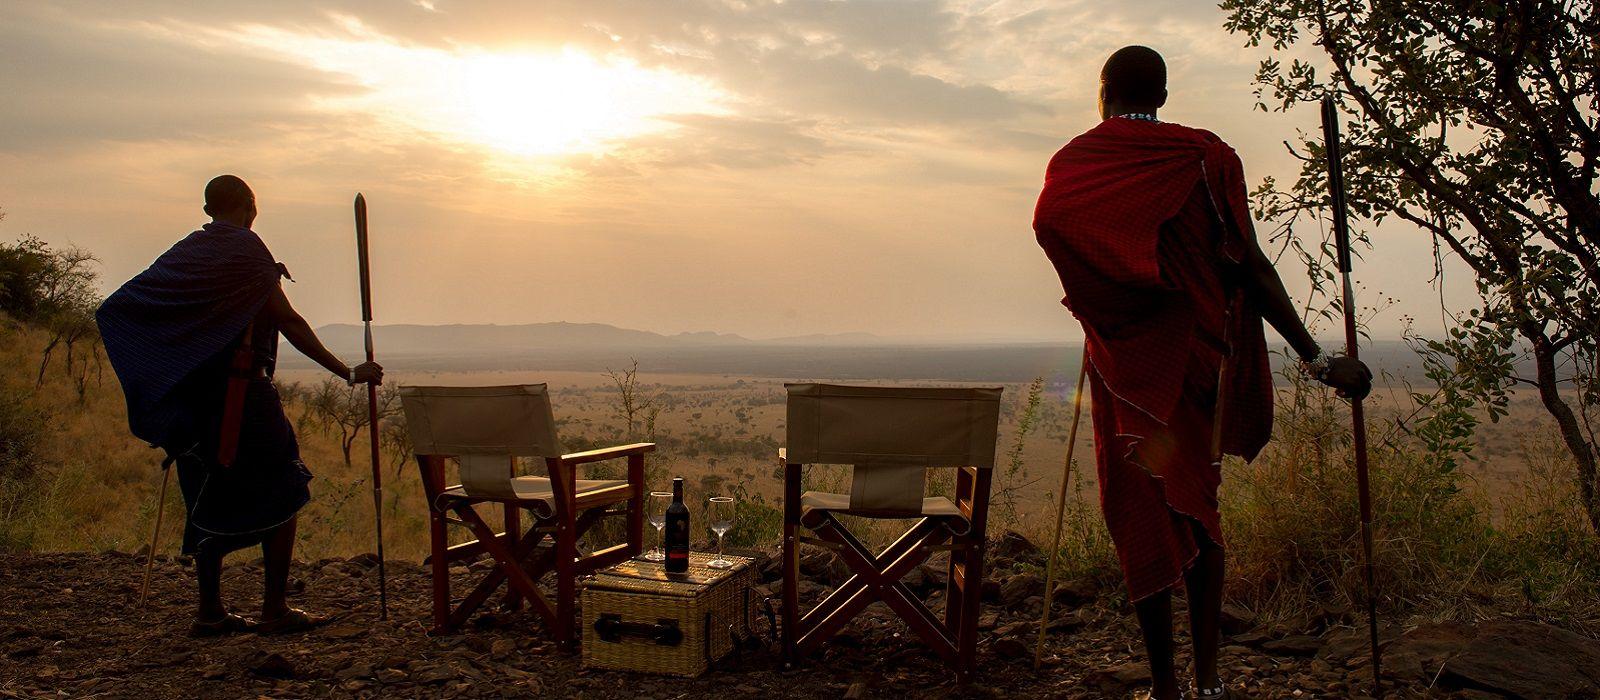 Safari Höhepunkte: Tansania, Simbabwe und Botswana Urlaub 6